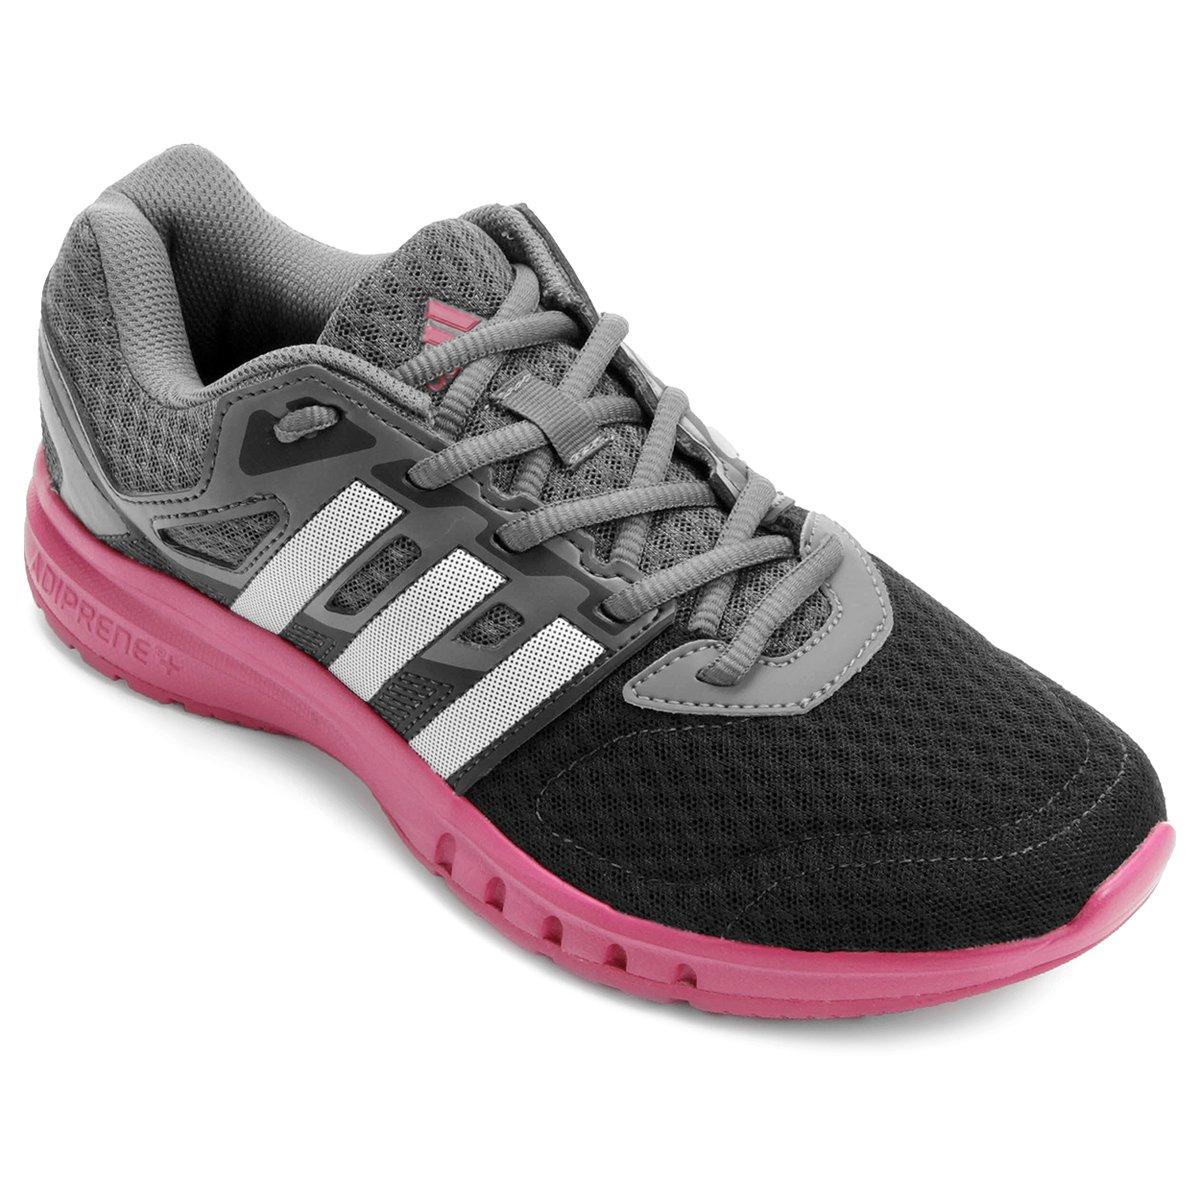 9a8ee5048b7 Tênis Adidas Galaxy 2 Feminino - Compre Agora